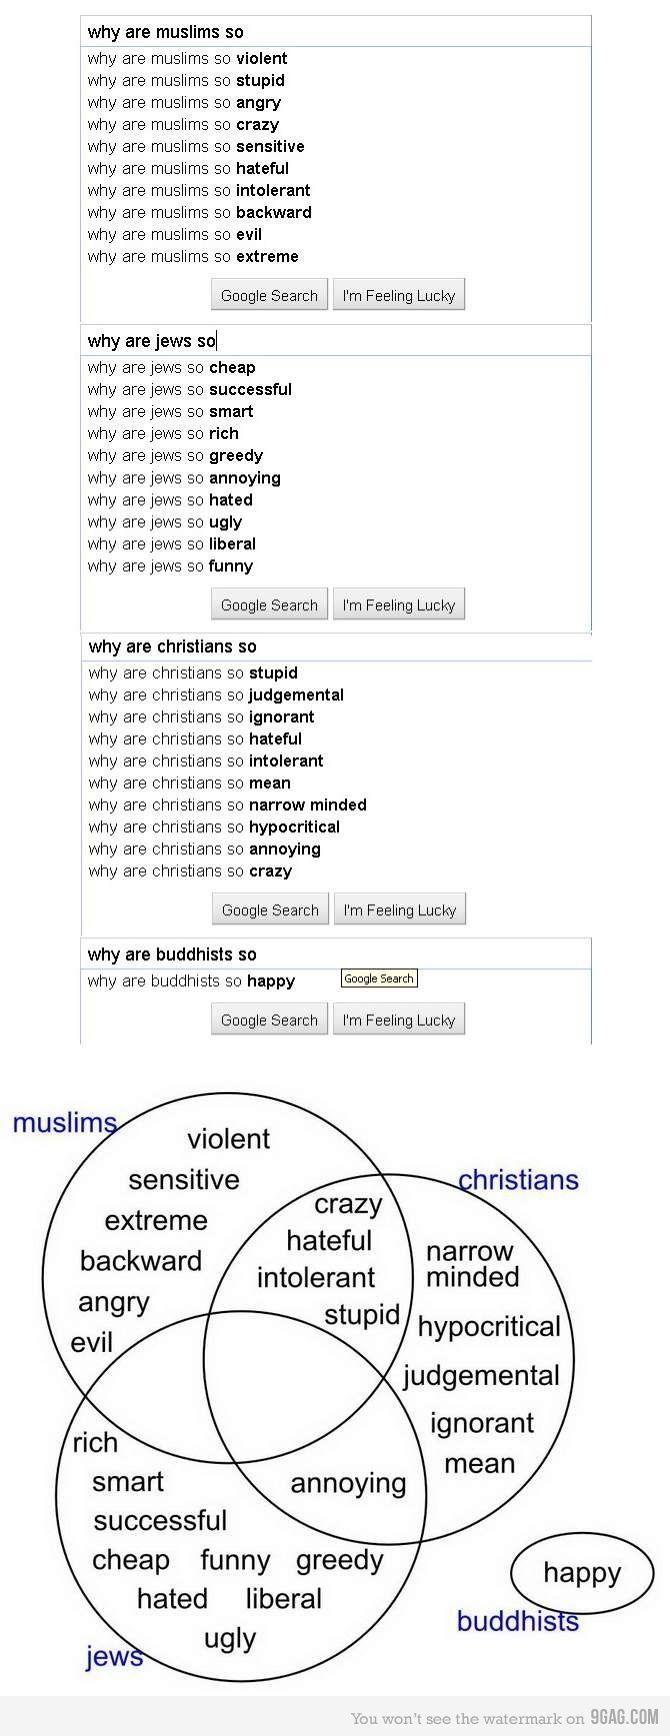 religions diagram according to google